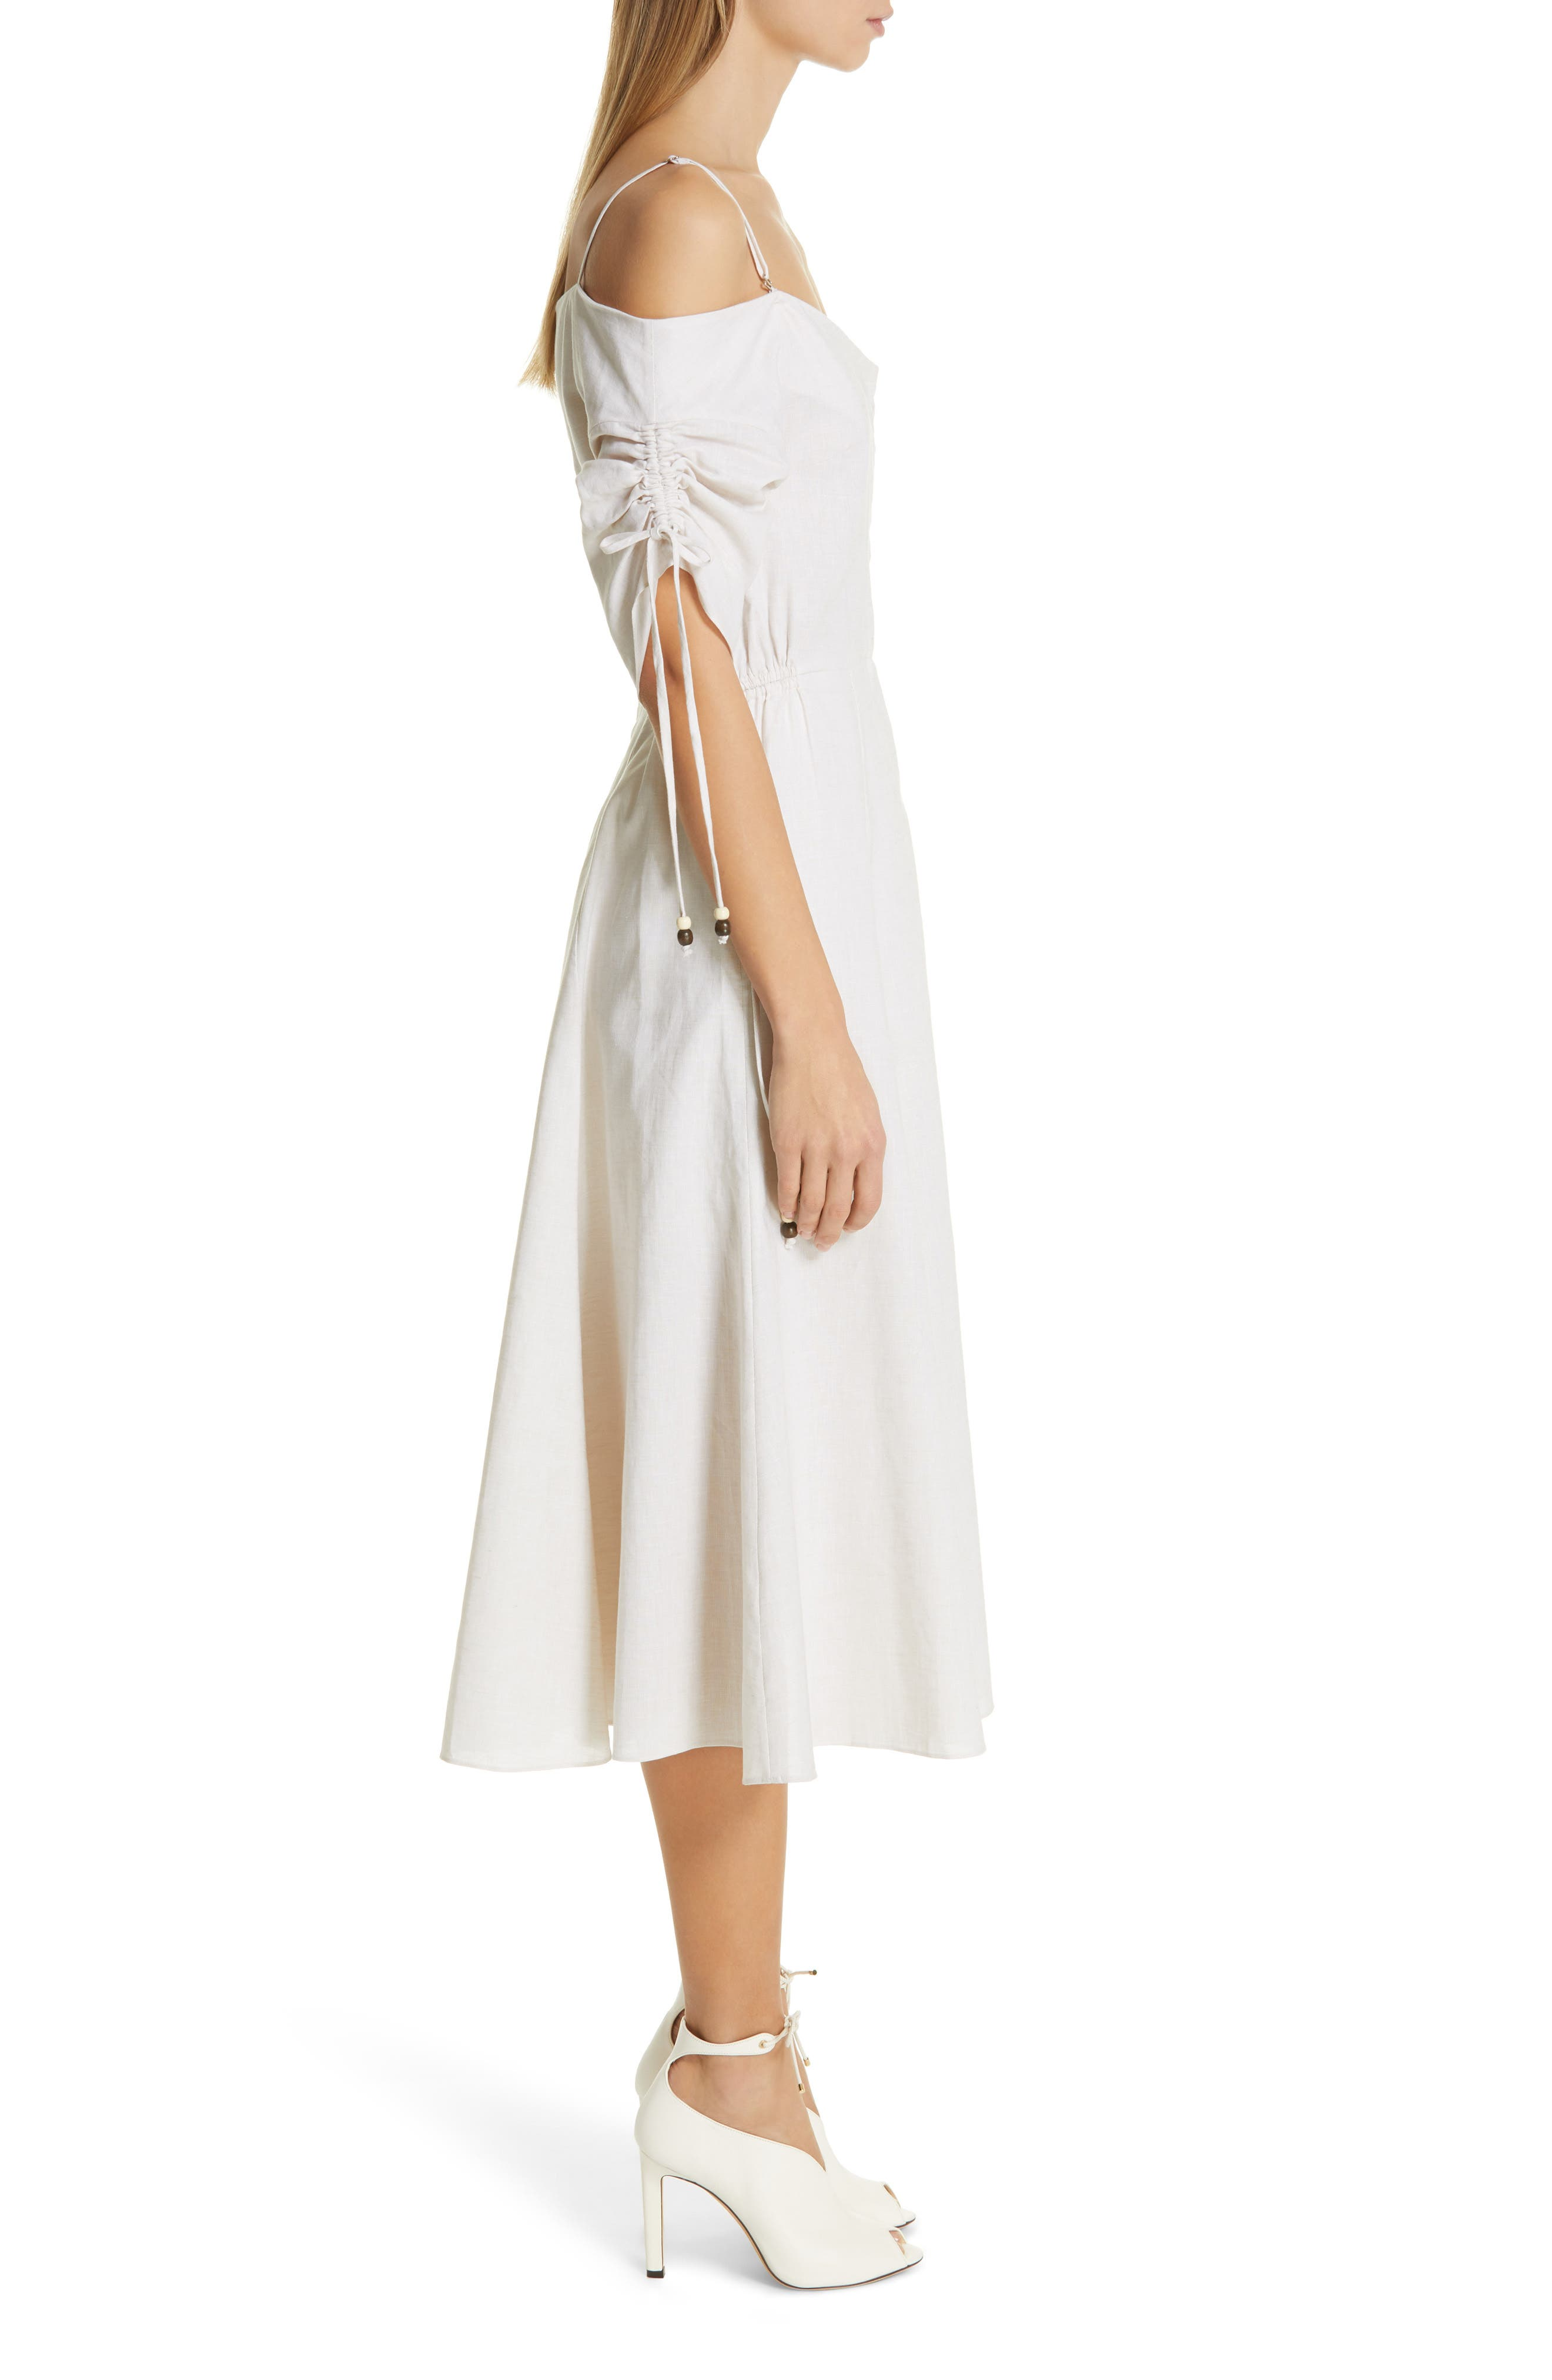 JONATHAN SIMKHAI,                             Off the Shoulder Cotton & Linen Dress,                             Alternate thumbnail 3, color,                             ECRU